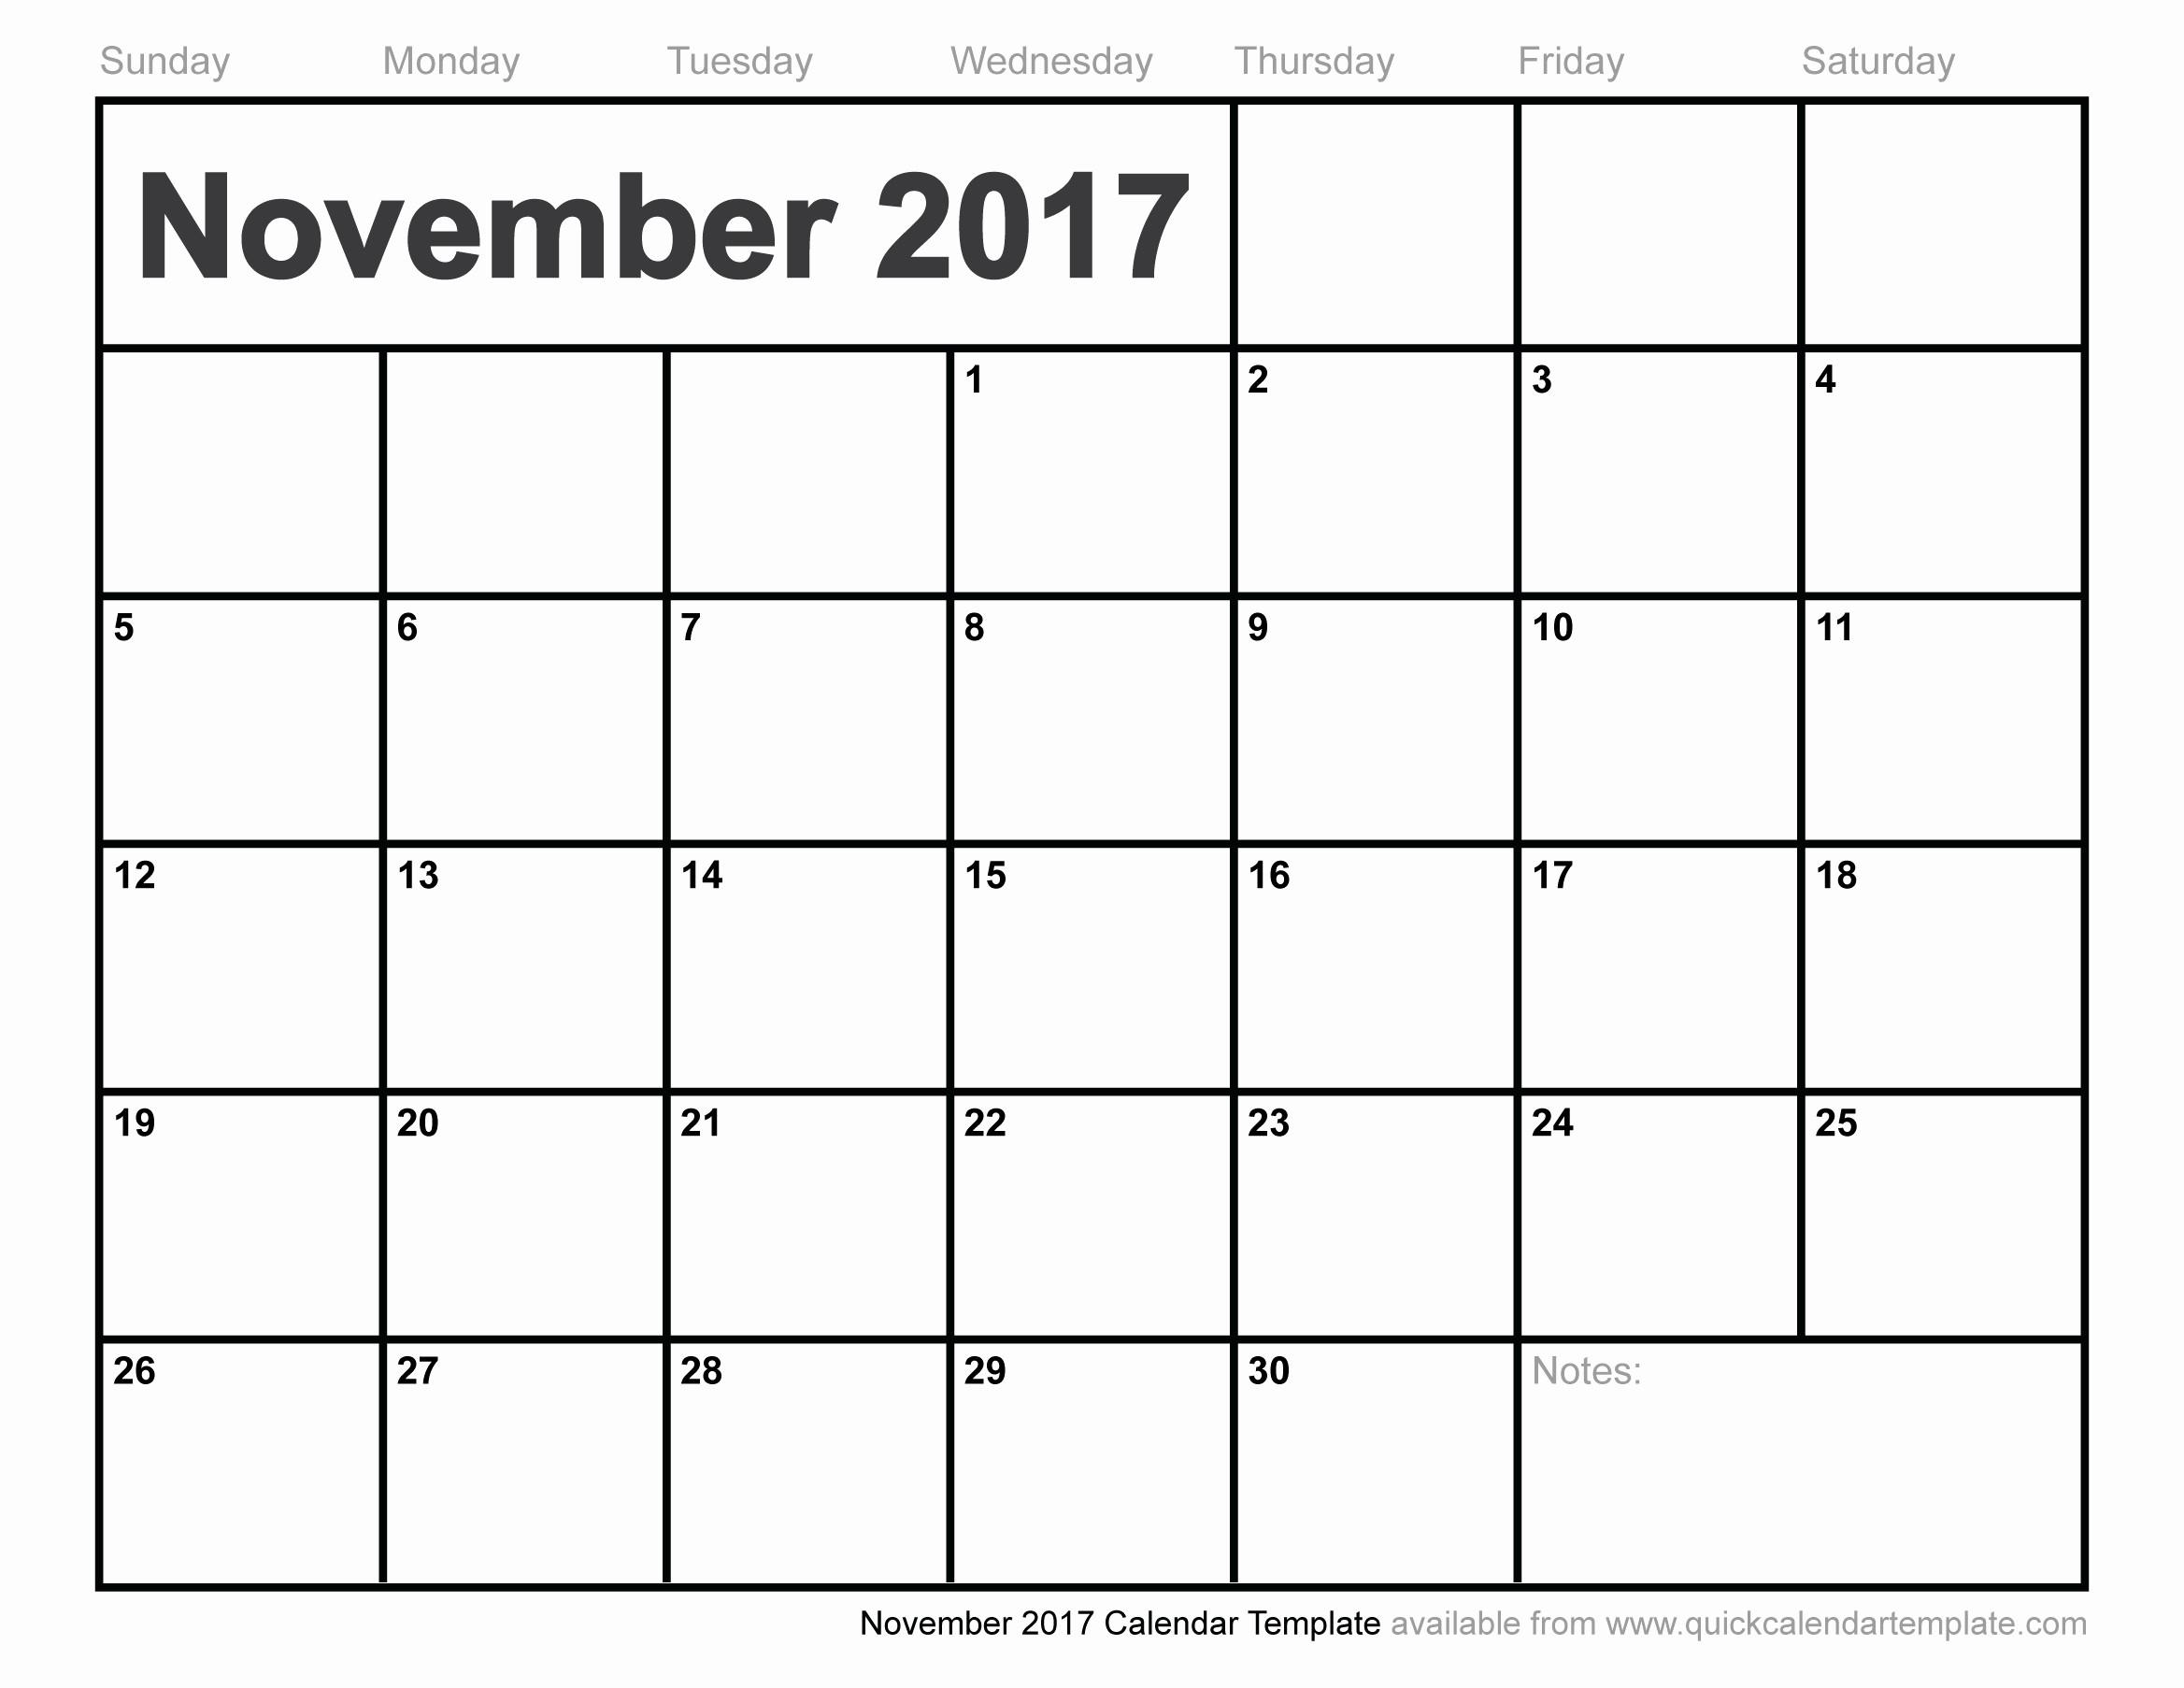 Blank November 2017 Calendar Template Inspirational Blank November 2017 Calendar